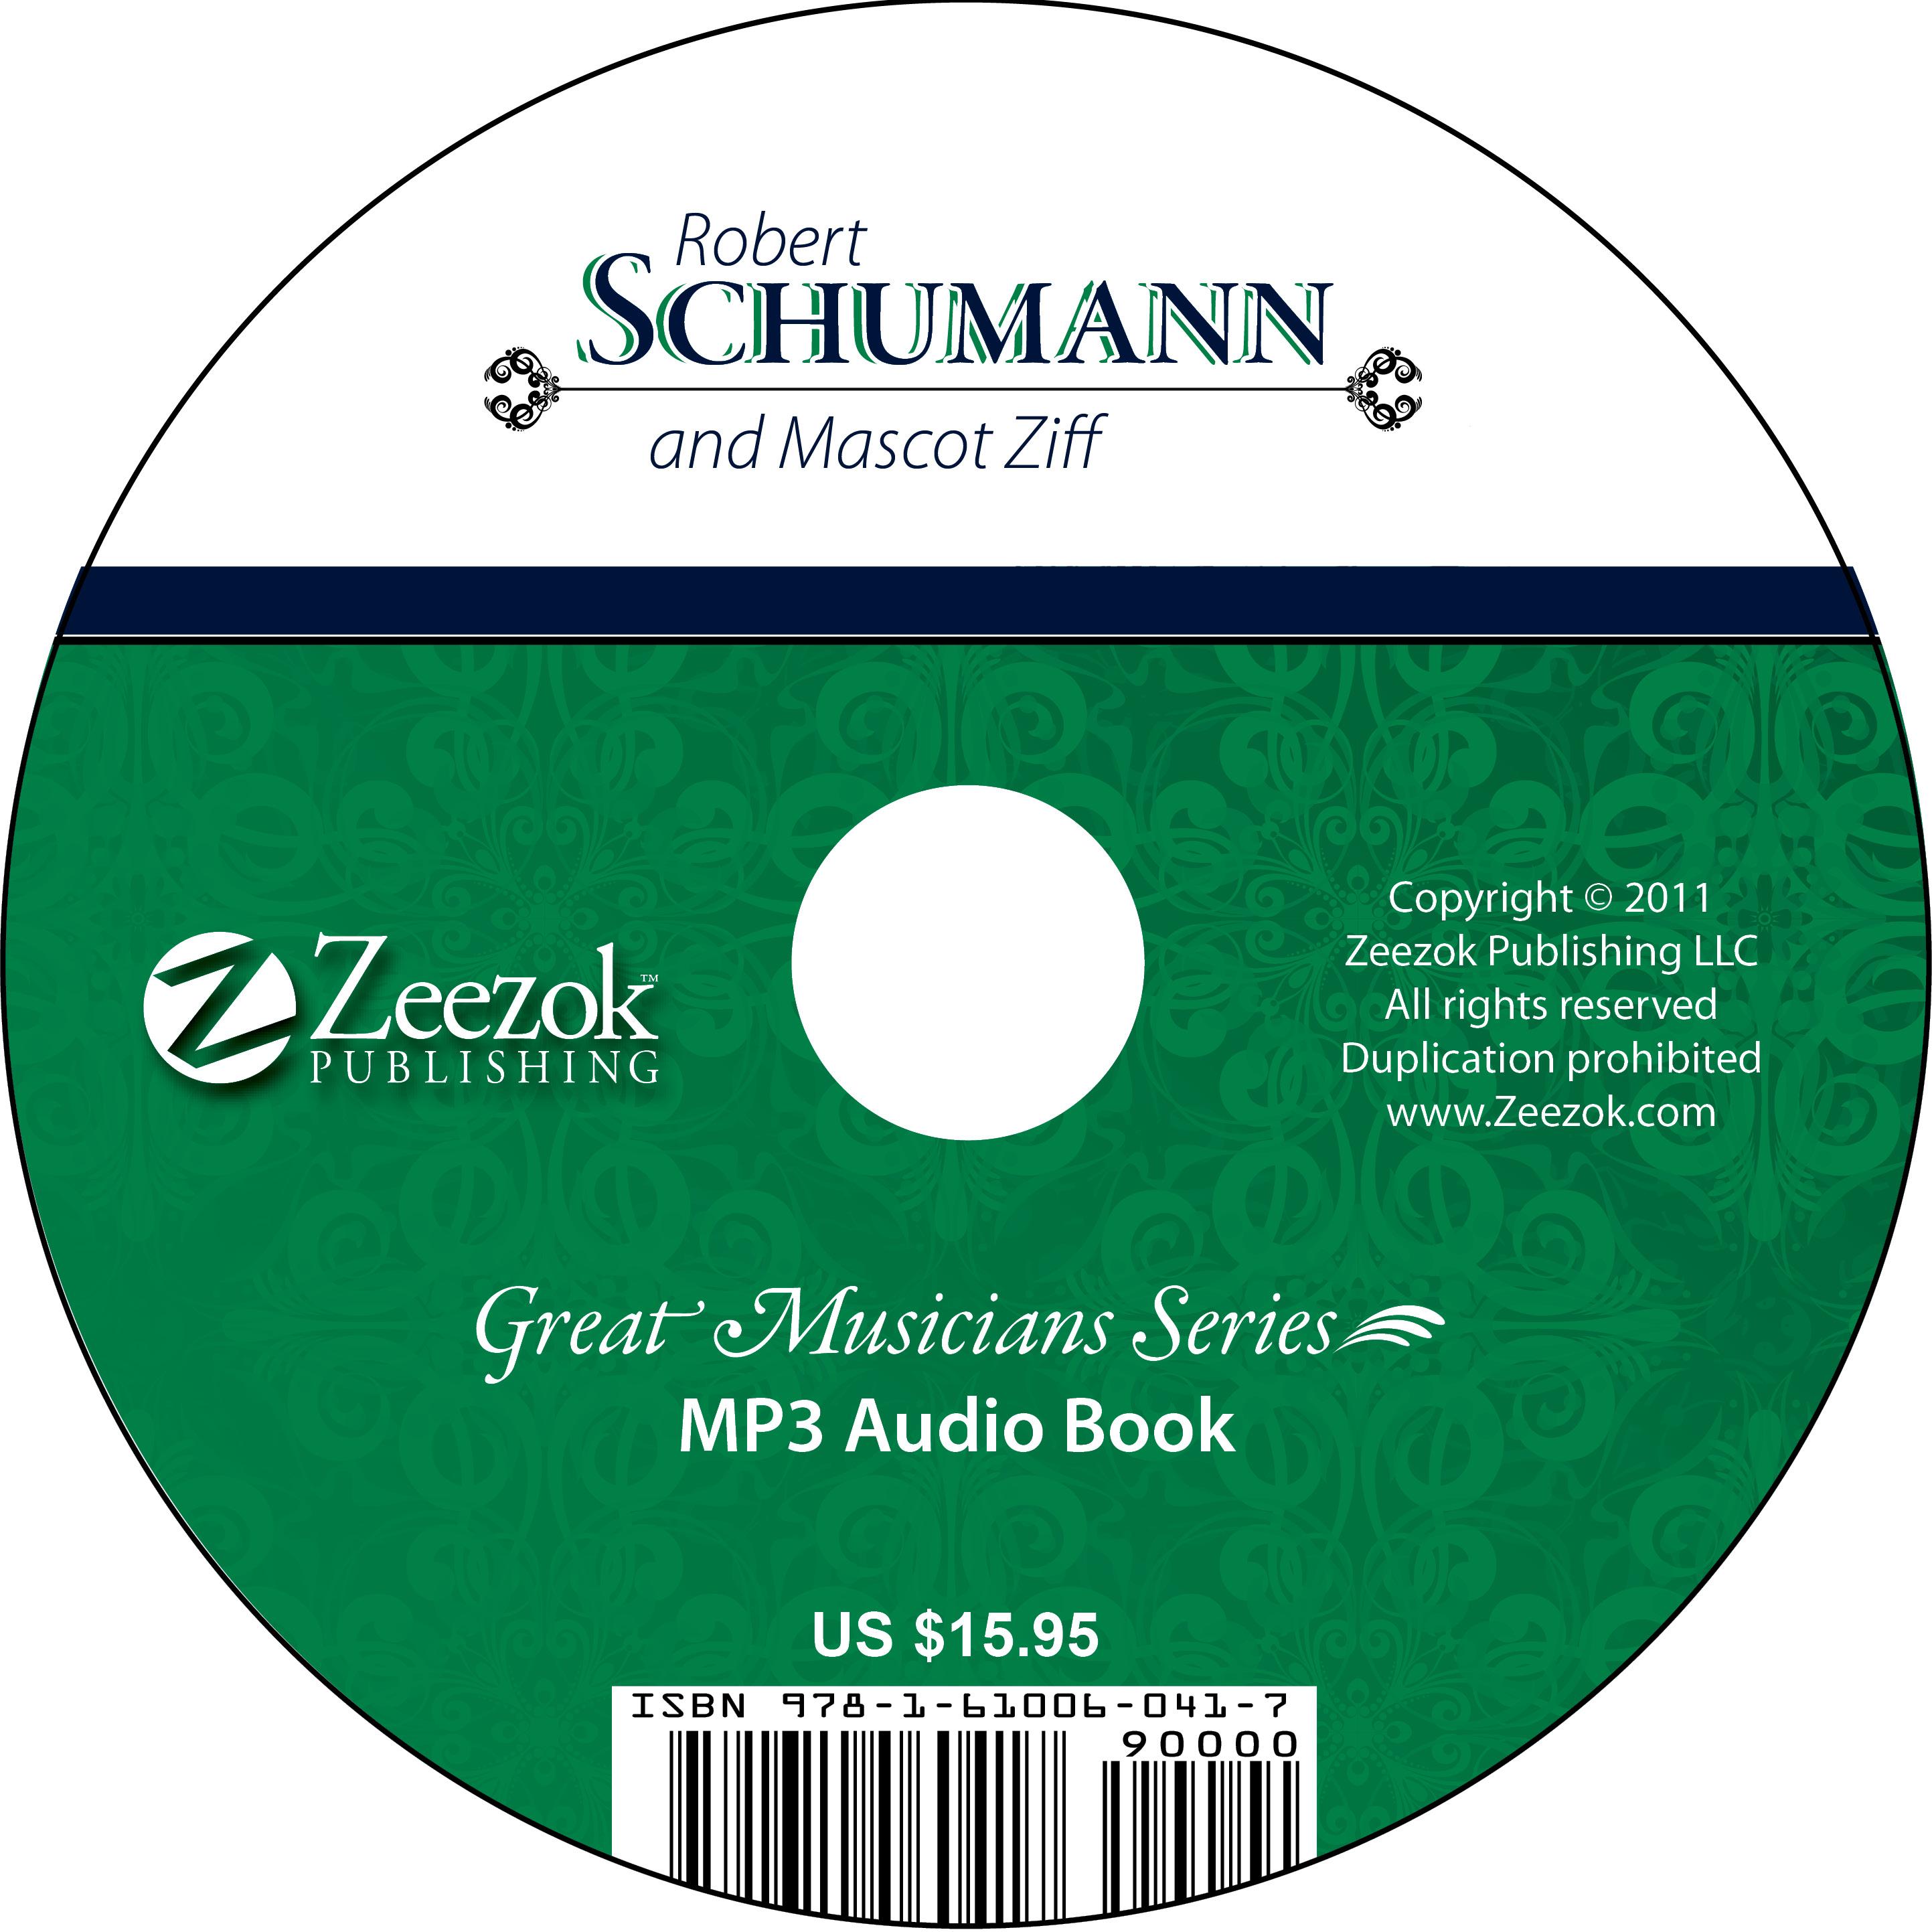 Robert Schumann and Mascot Ziff Audio Book on CD (MP3 format) - photo#7